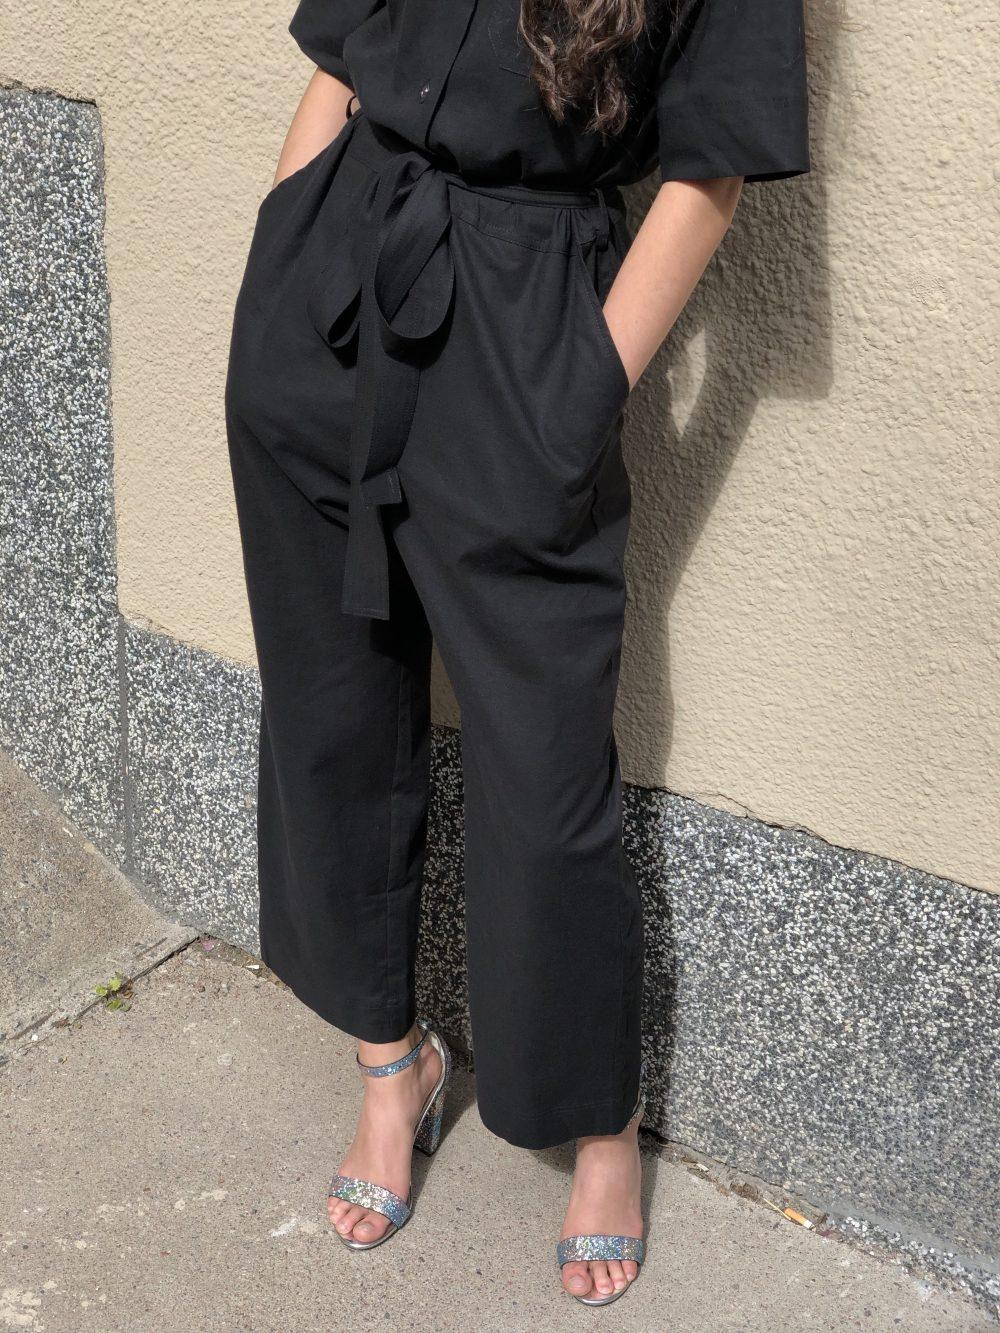 Vimma UUTTA Jumpsuit HARRI one-colored black S-L - black, HARRI, one-colored, S-L, UUTTA Jumpsuit